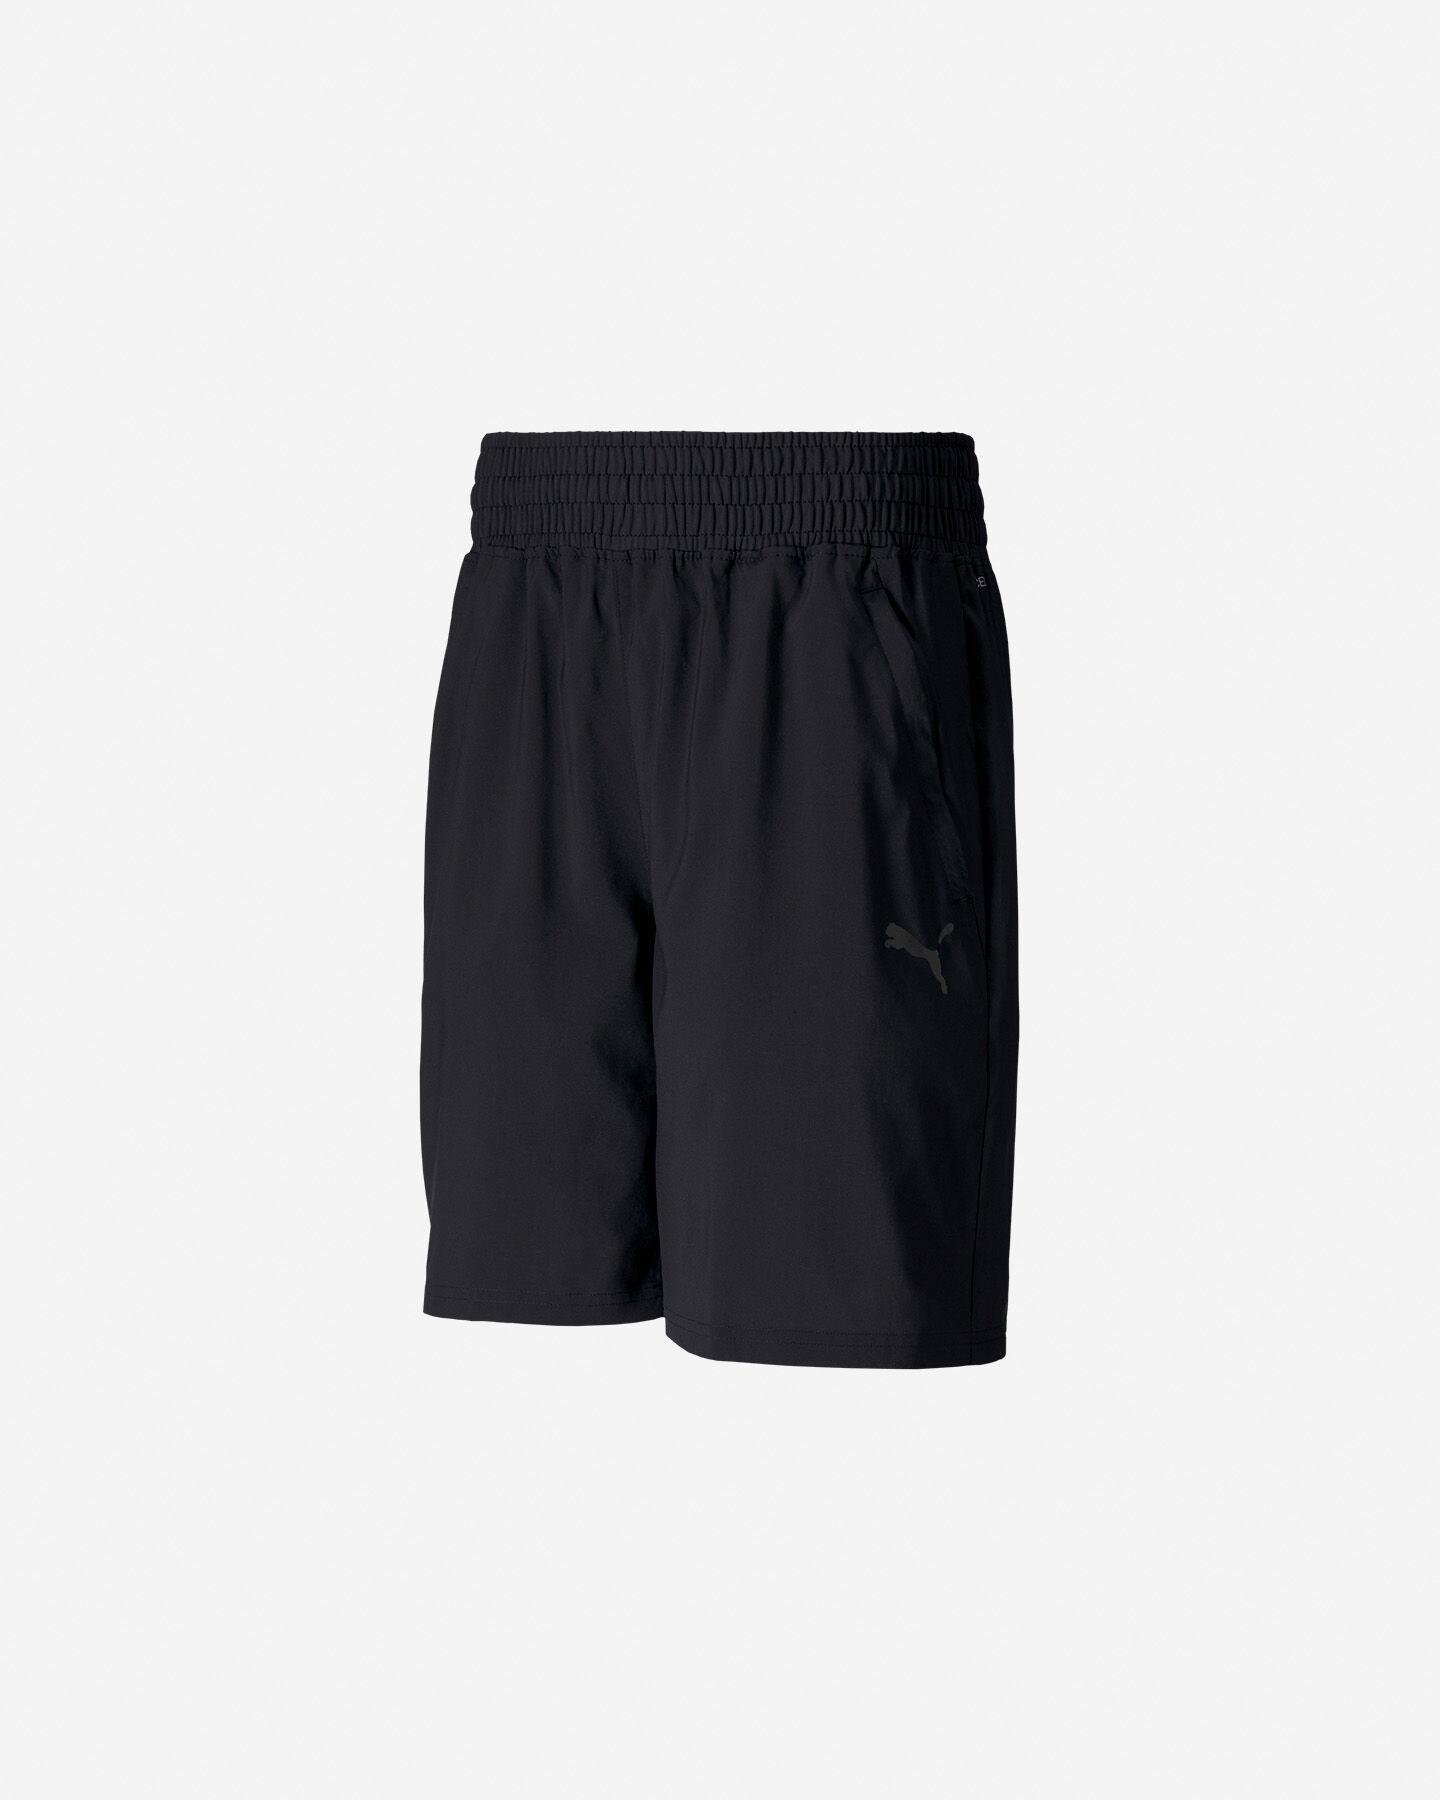 Pantalone training PUMA POWER 37,5 M S5234776 scatto 0